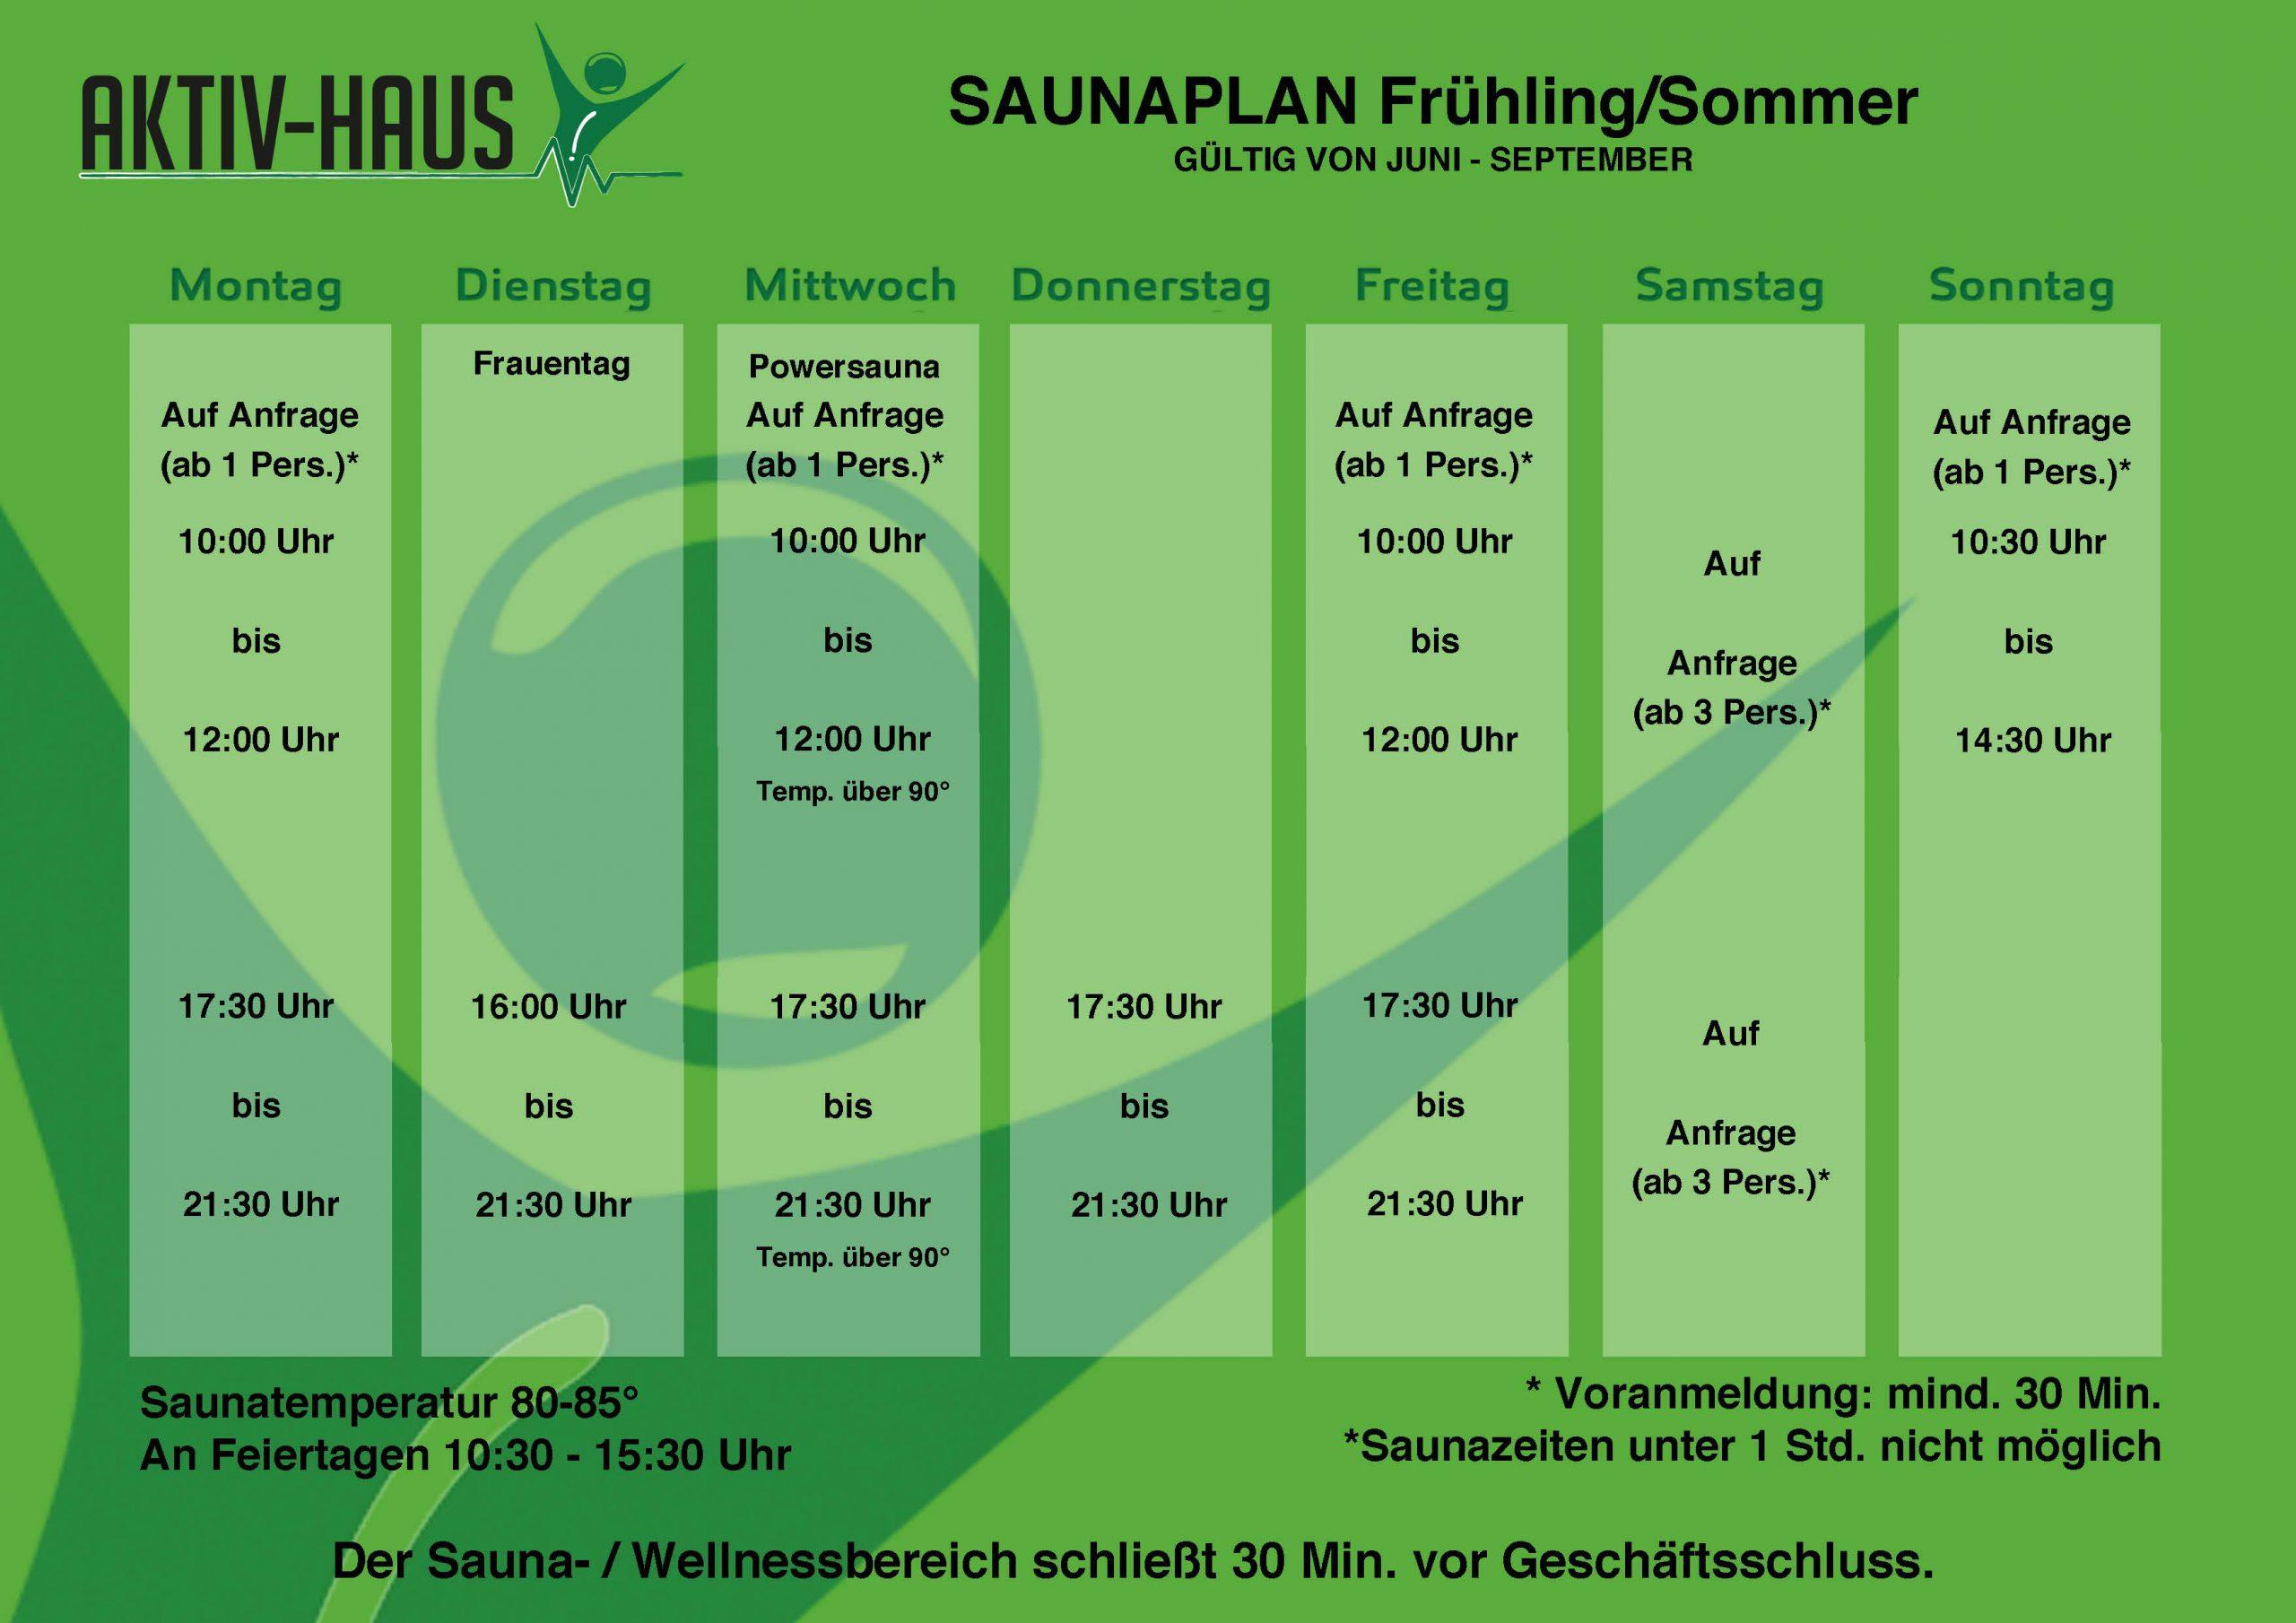 Saunaplan_FrühlingSommer